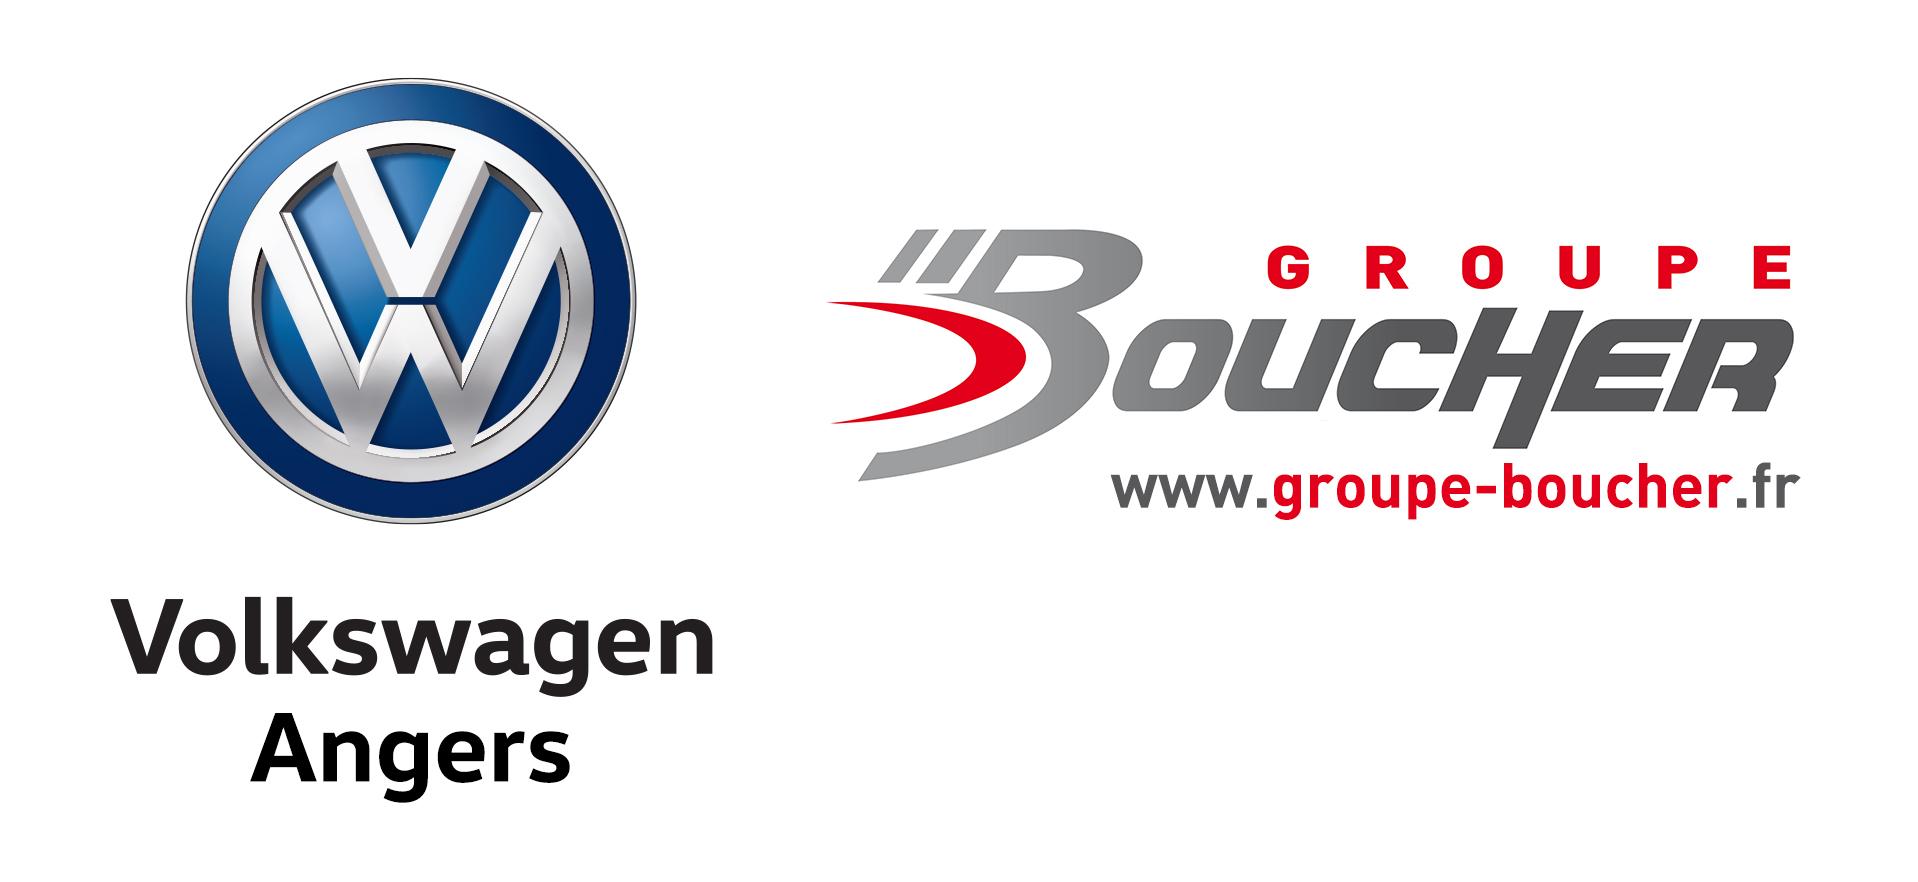 Groupe Boucher : volkwagen sur Angers